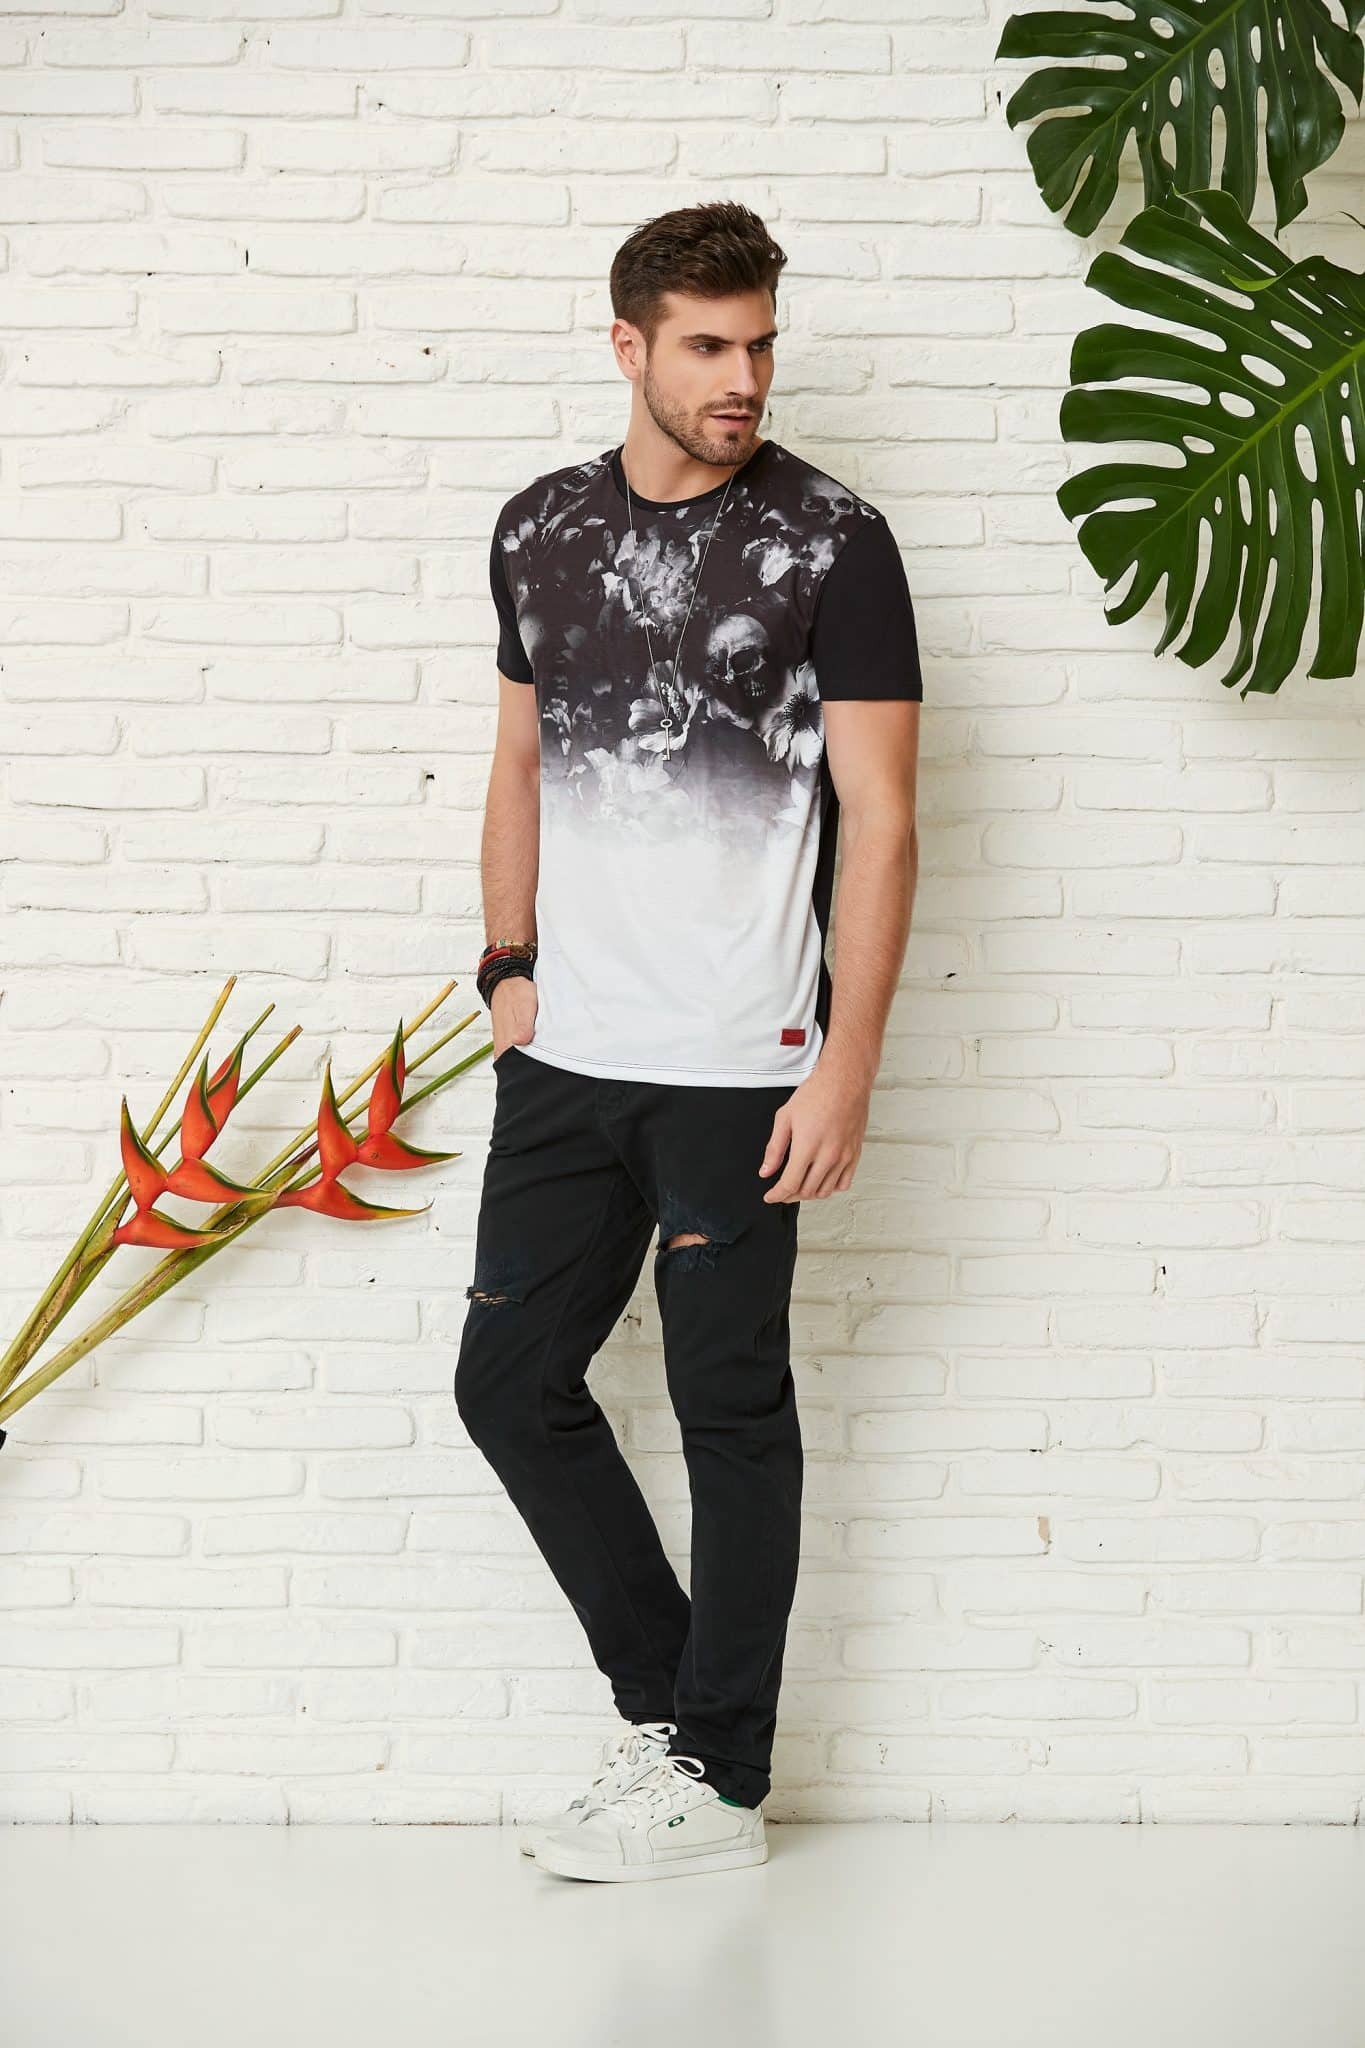 roupas masculinas para a primavera 2018